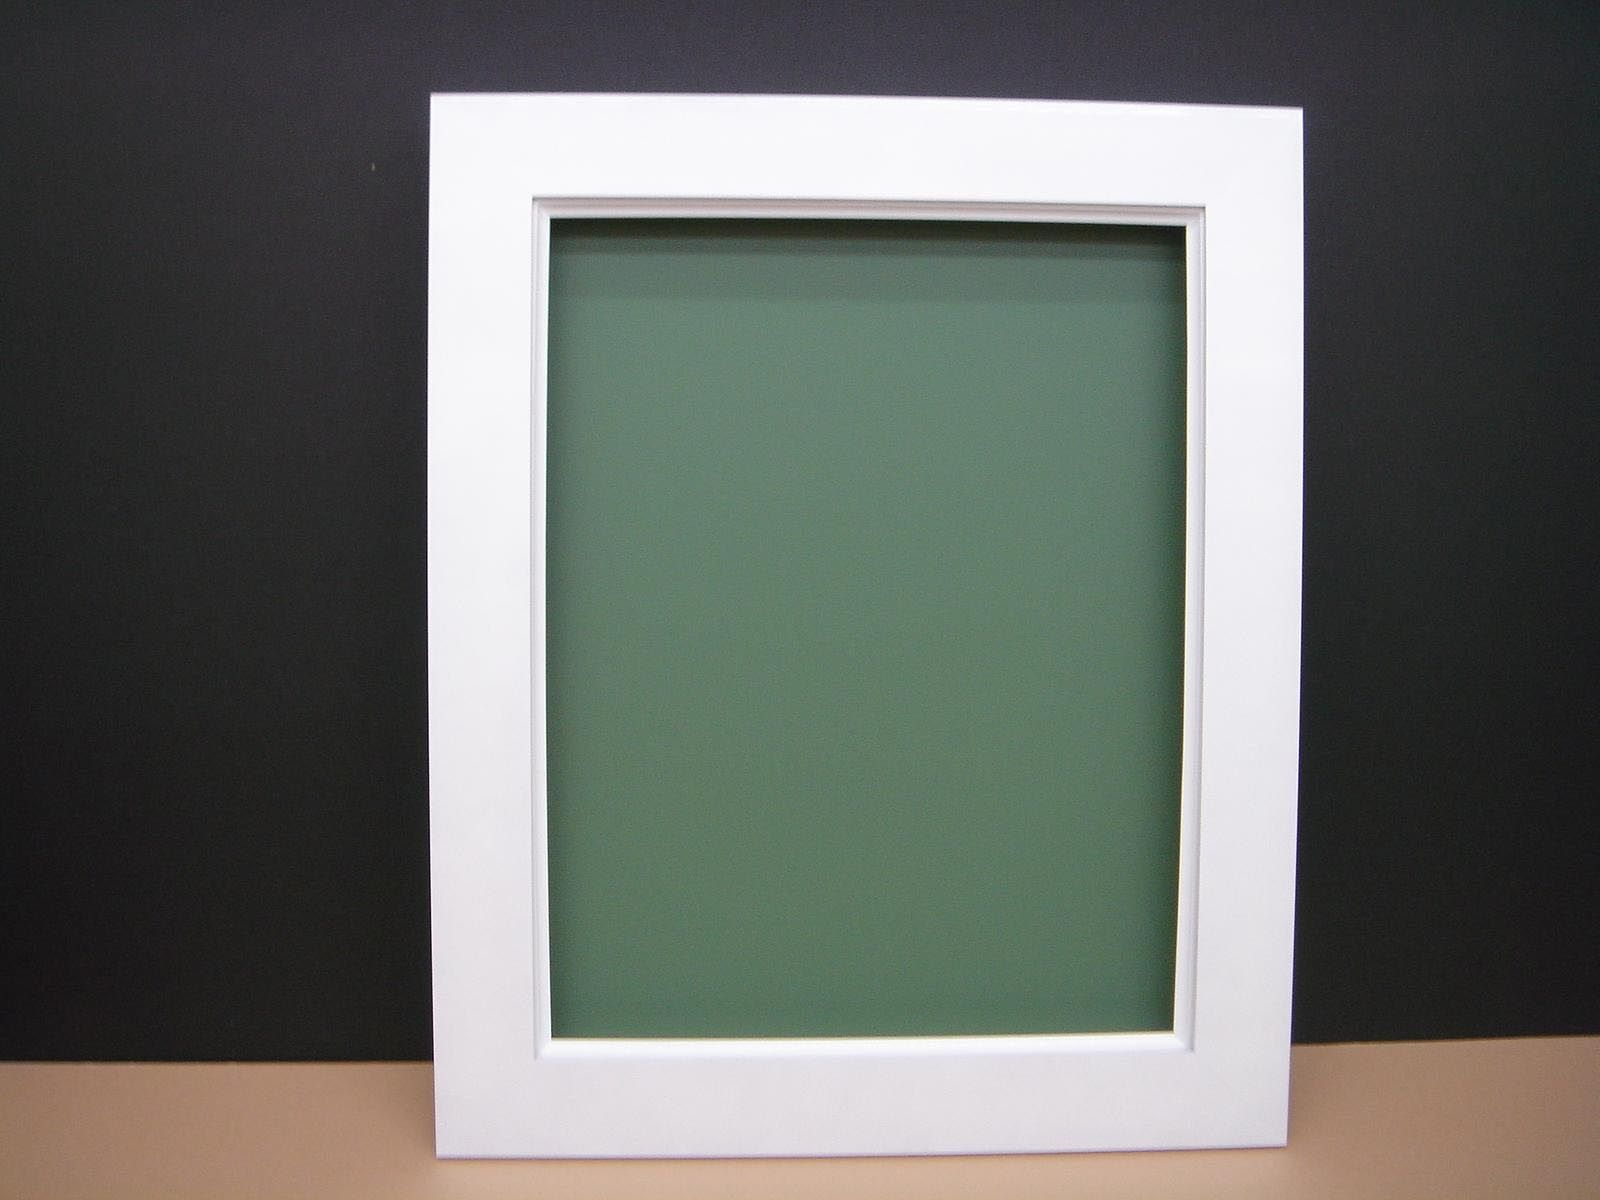 painting picture frames white   frames   pinterest